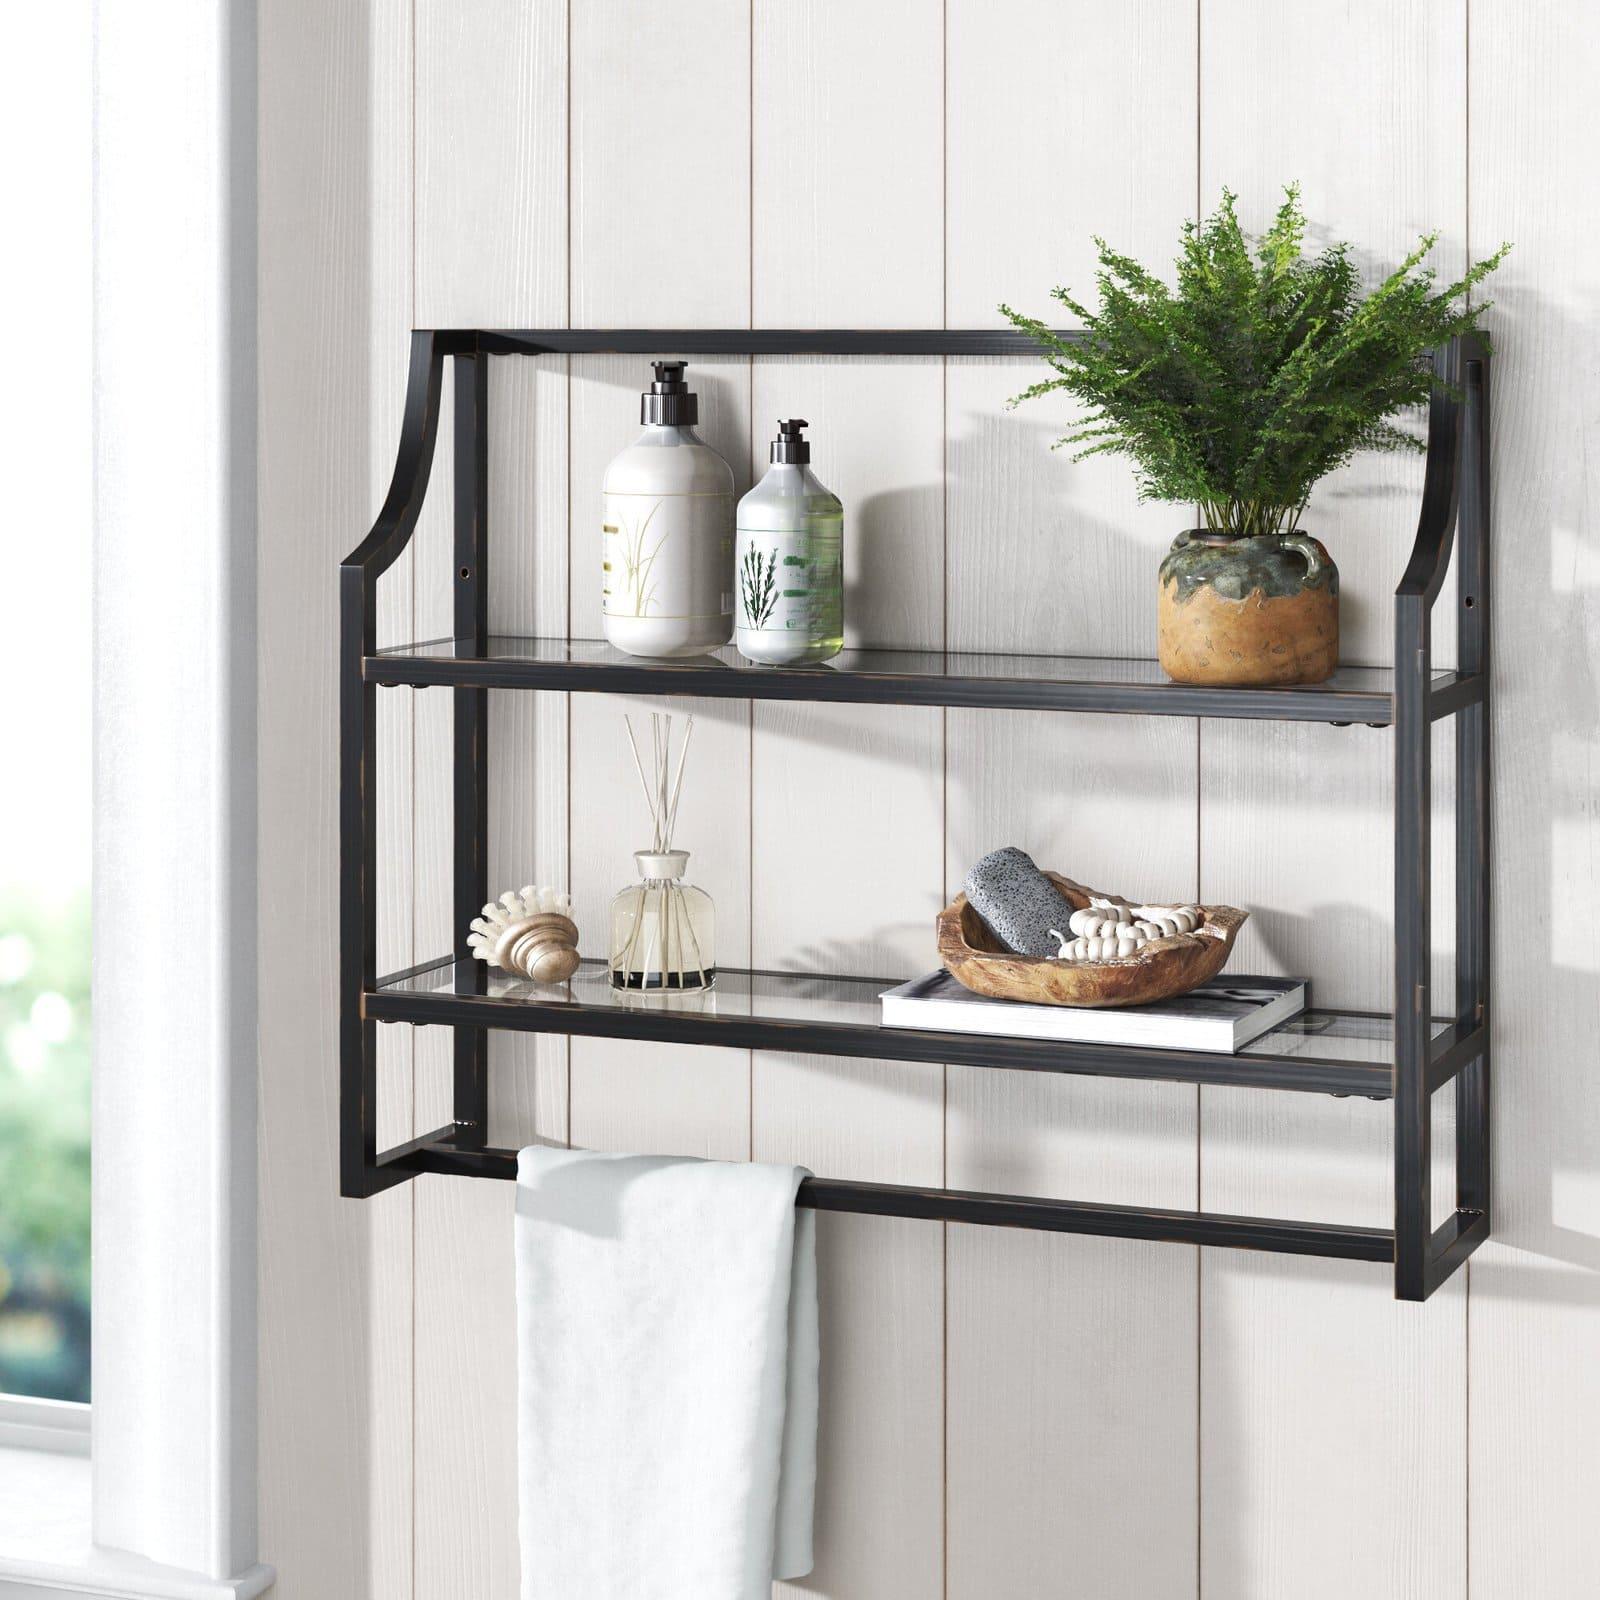 Chic Black Accent Shelf